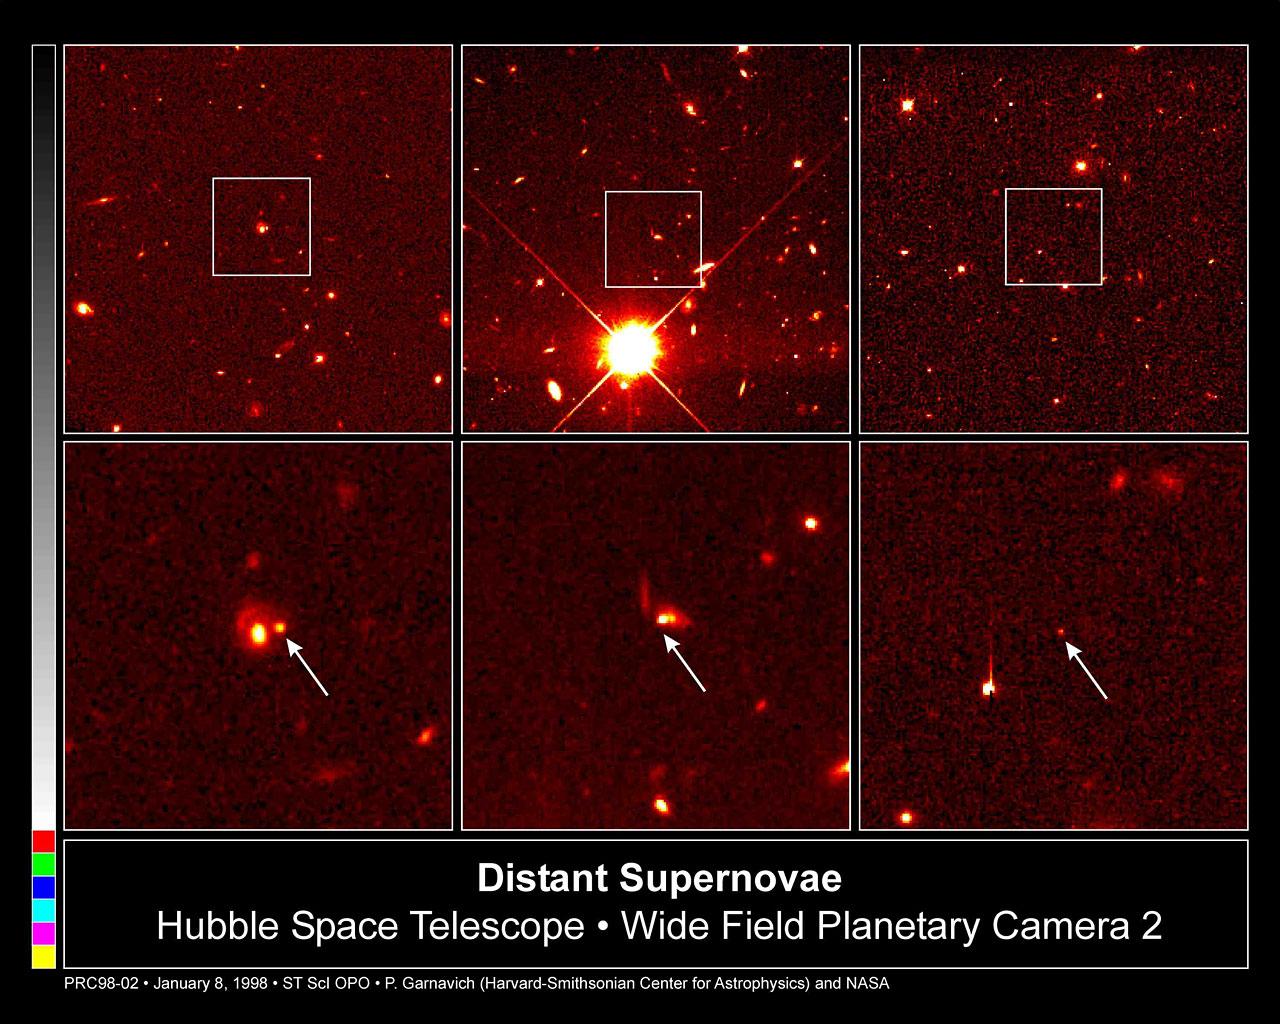 Distant Supernovae